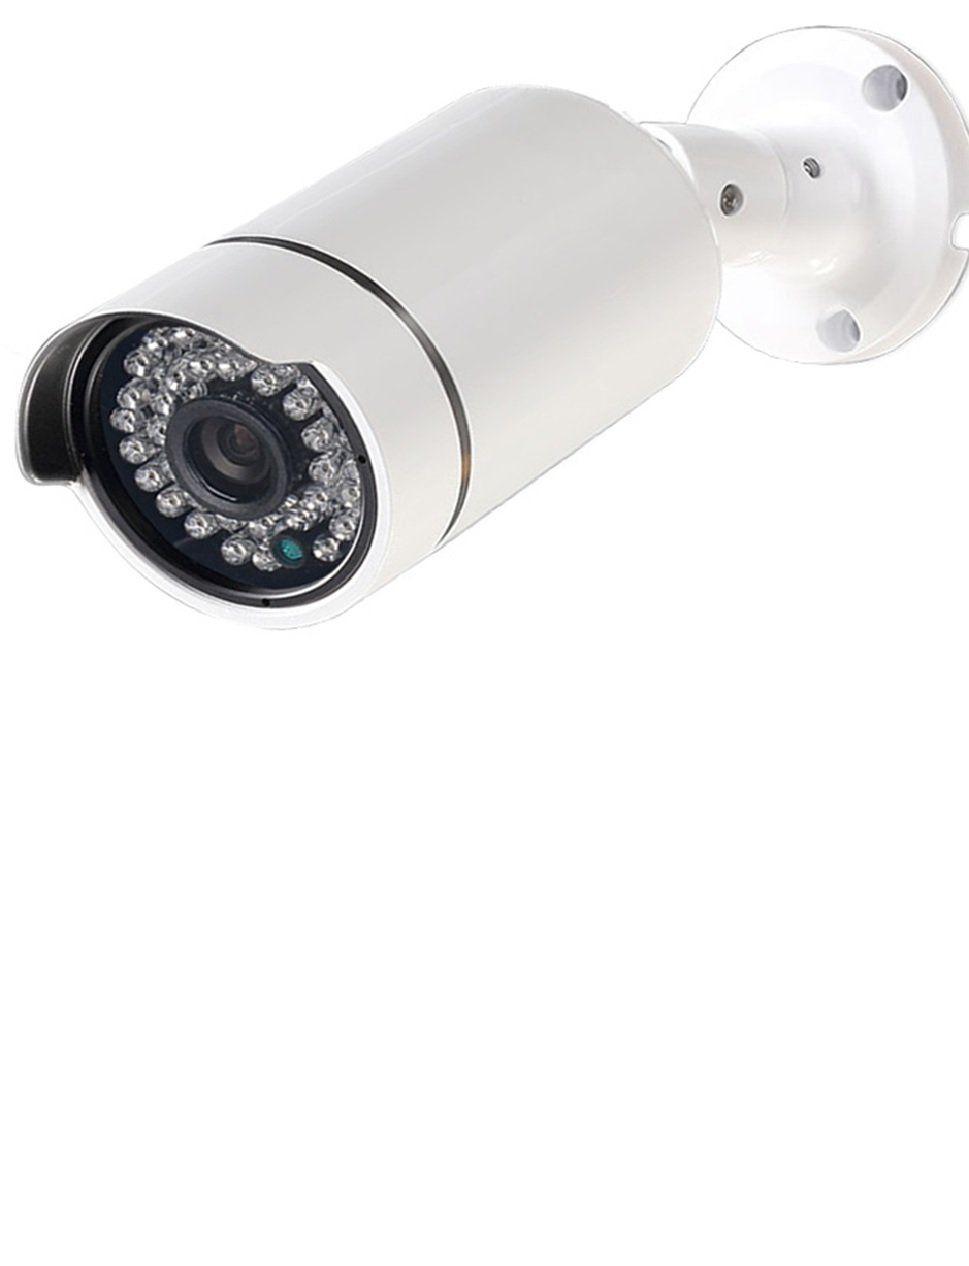 2017 NEW 2mp PoC IP Camera - Daisy Chain over Coax